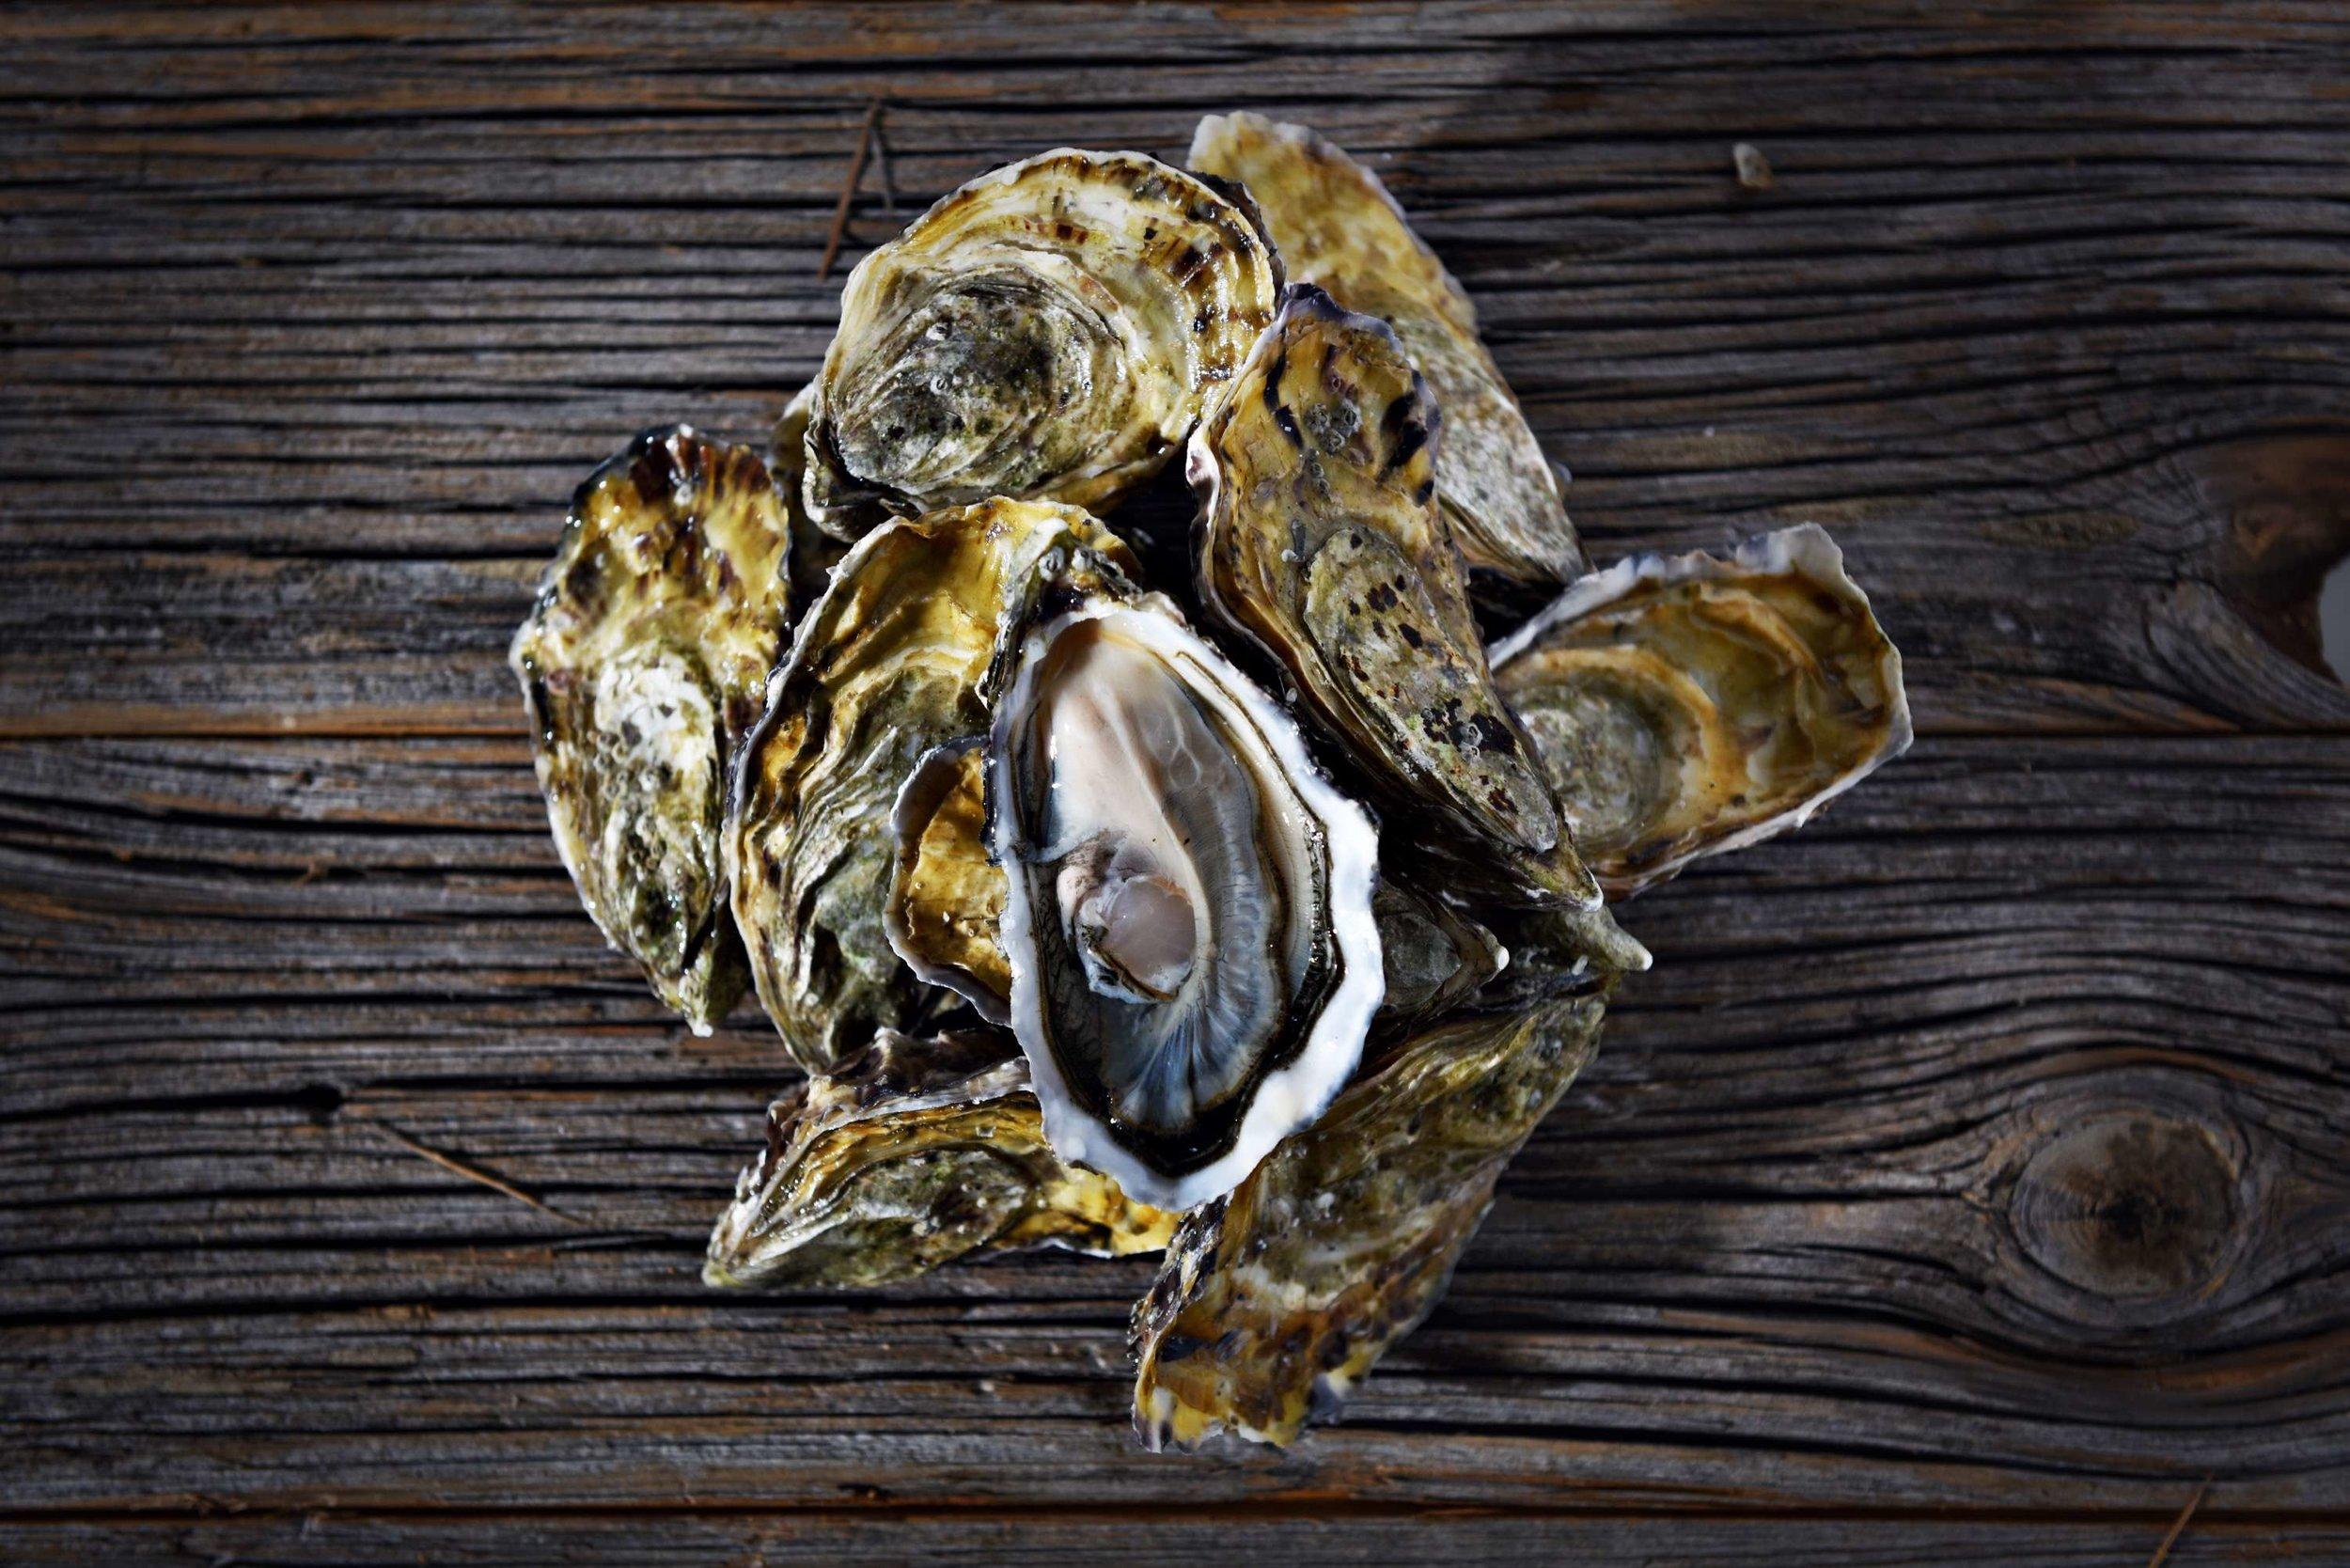 11 dome sur mer seafood schaal schelp kreeft restaurant bistro antwerpen frederic chabbert michelinstar bart albrecht tablefever.jpg